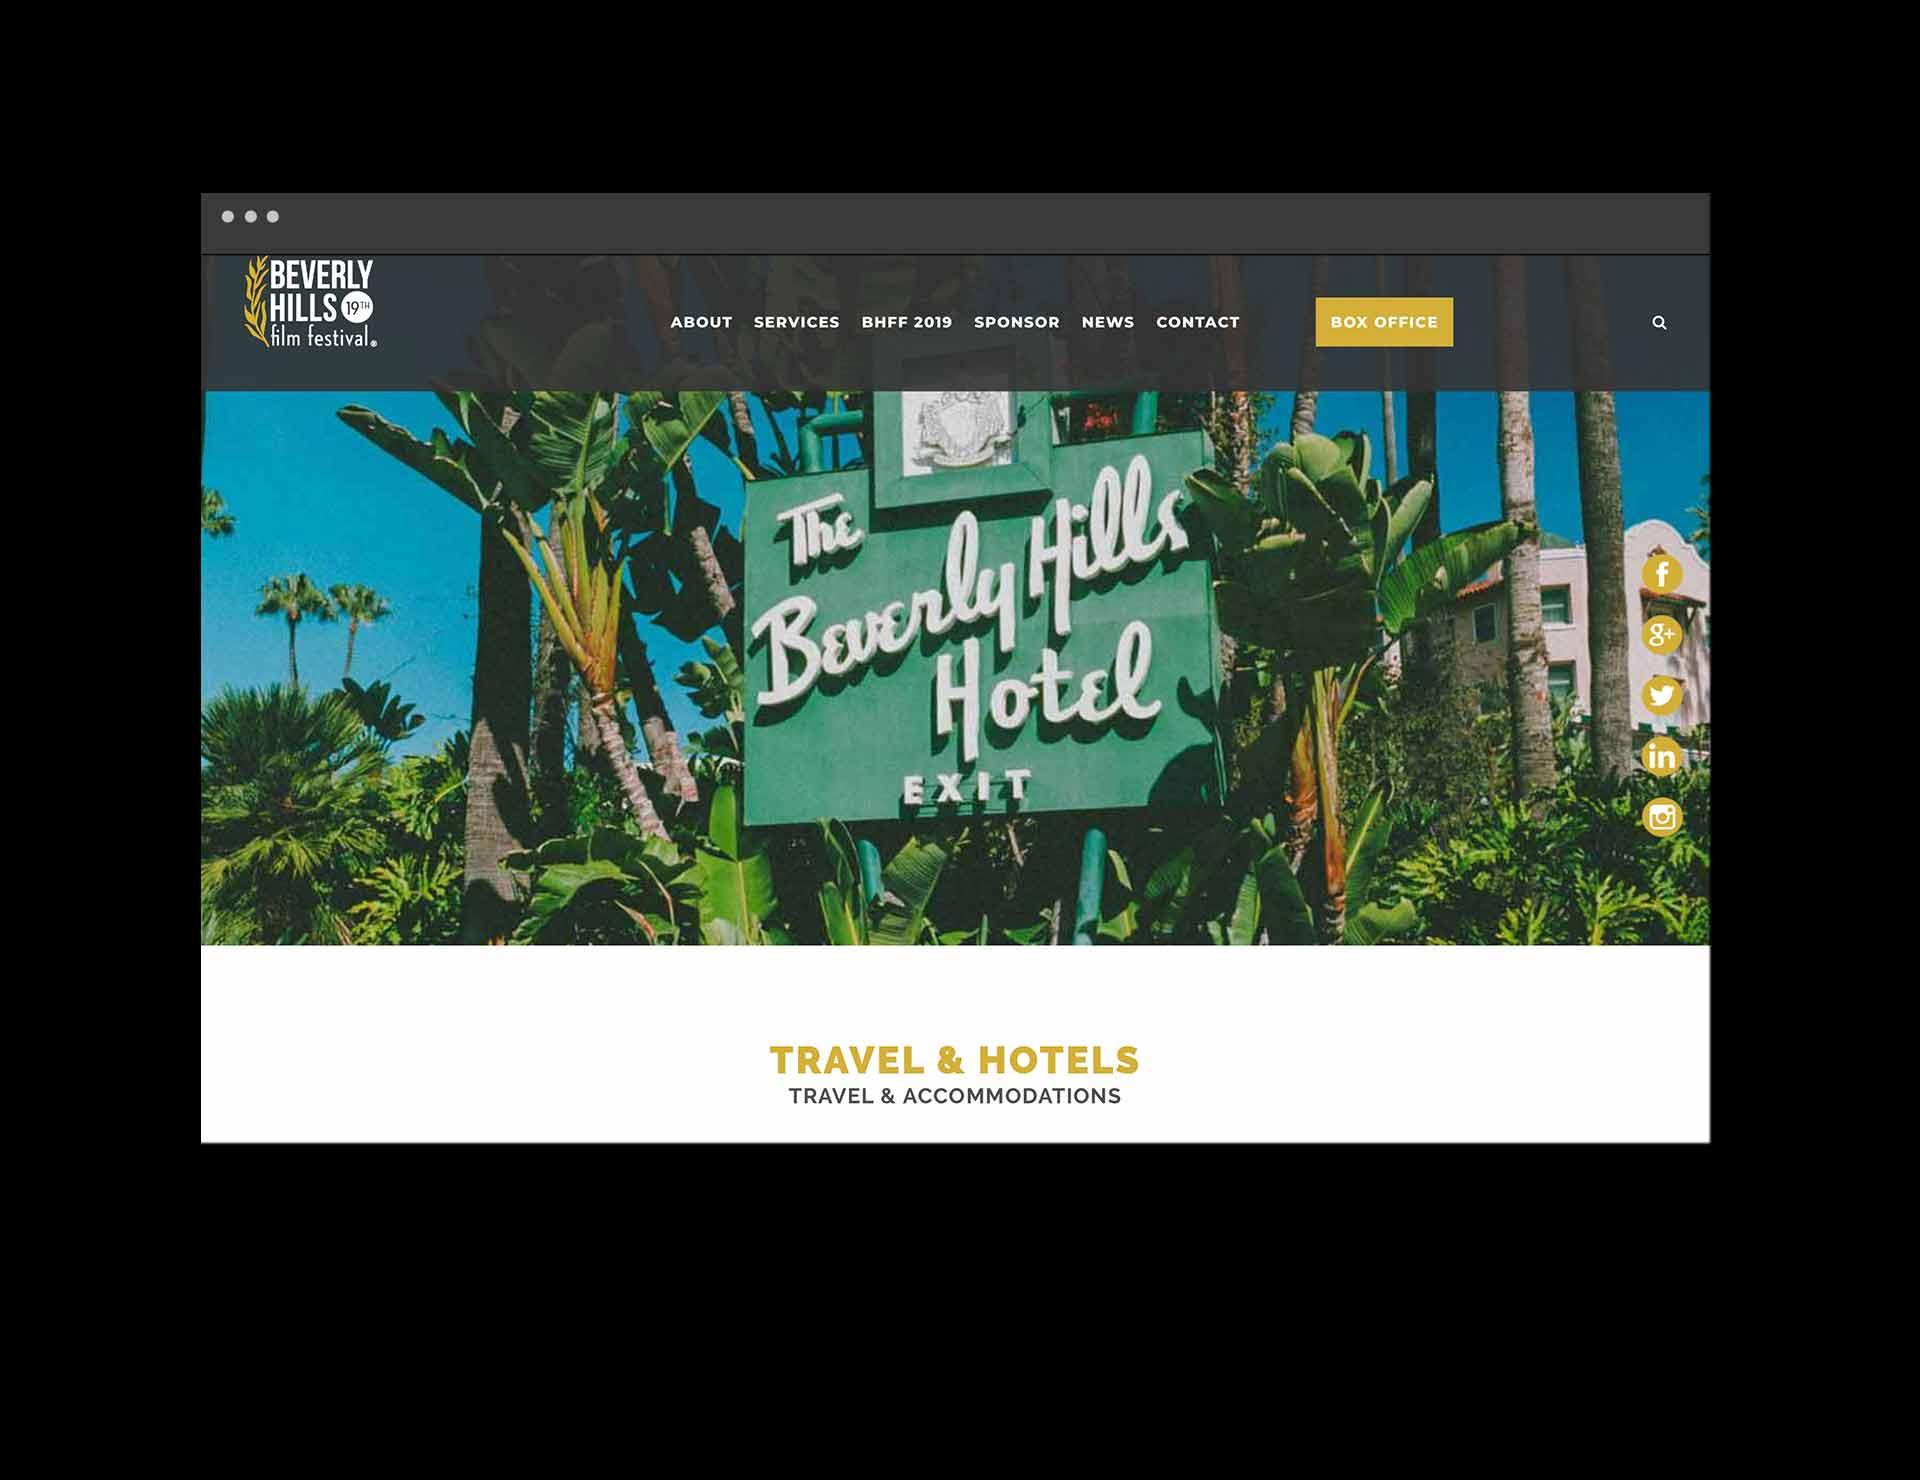 Beverly Hills Hotel web banner